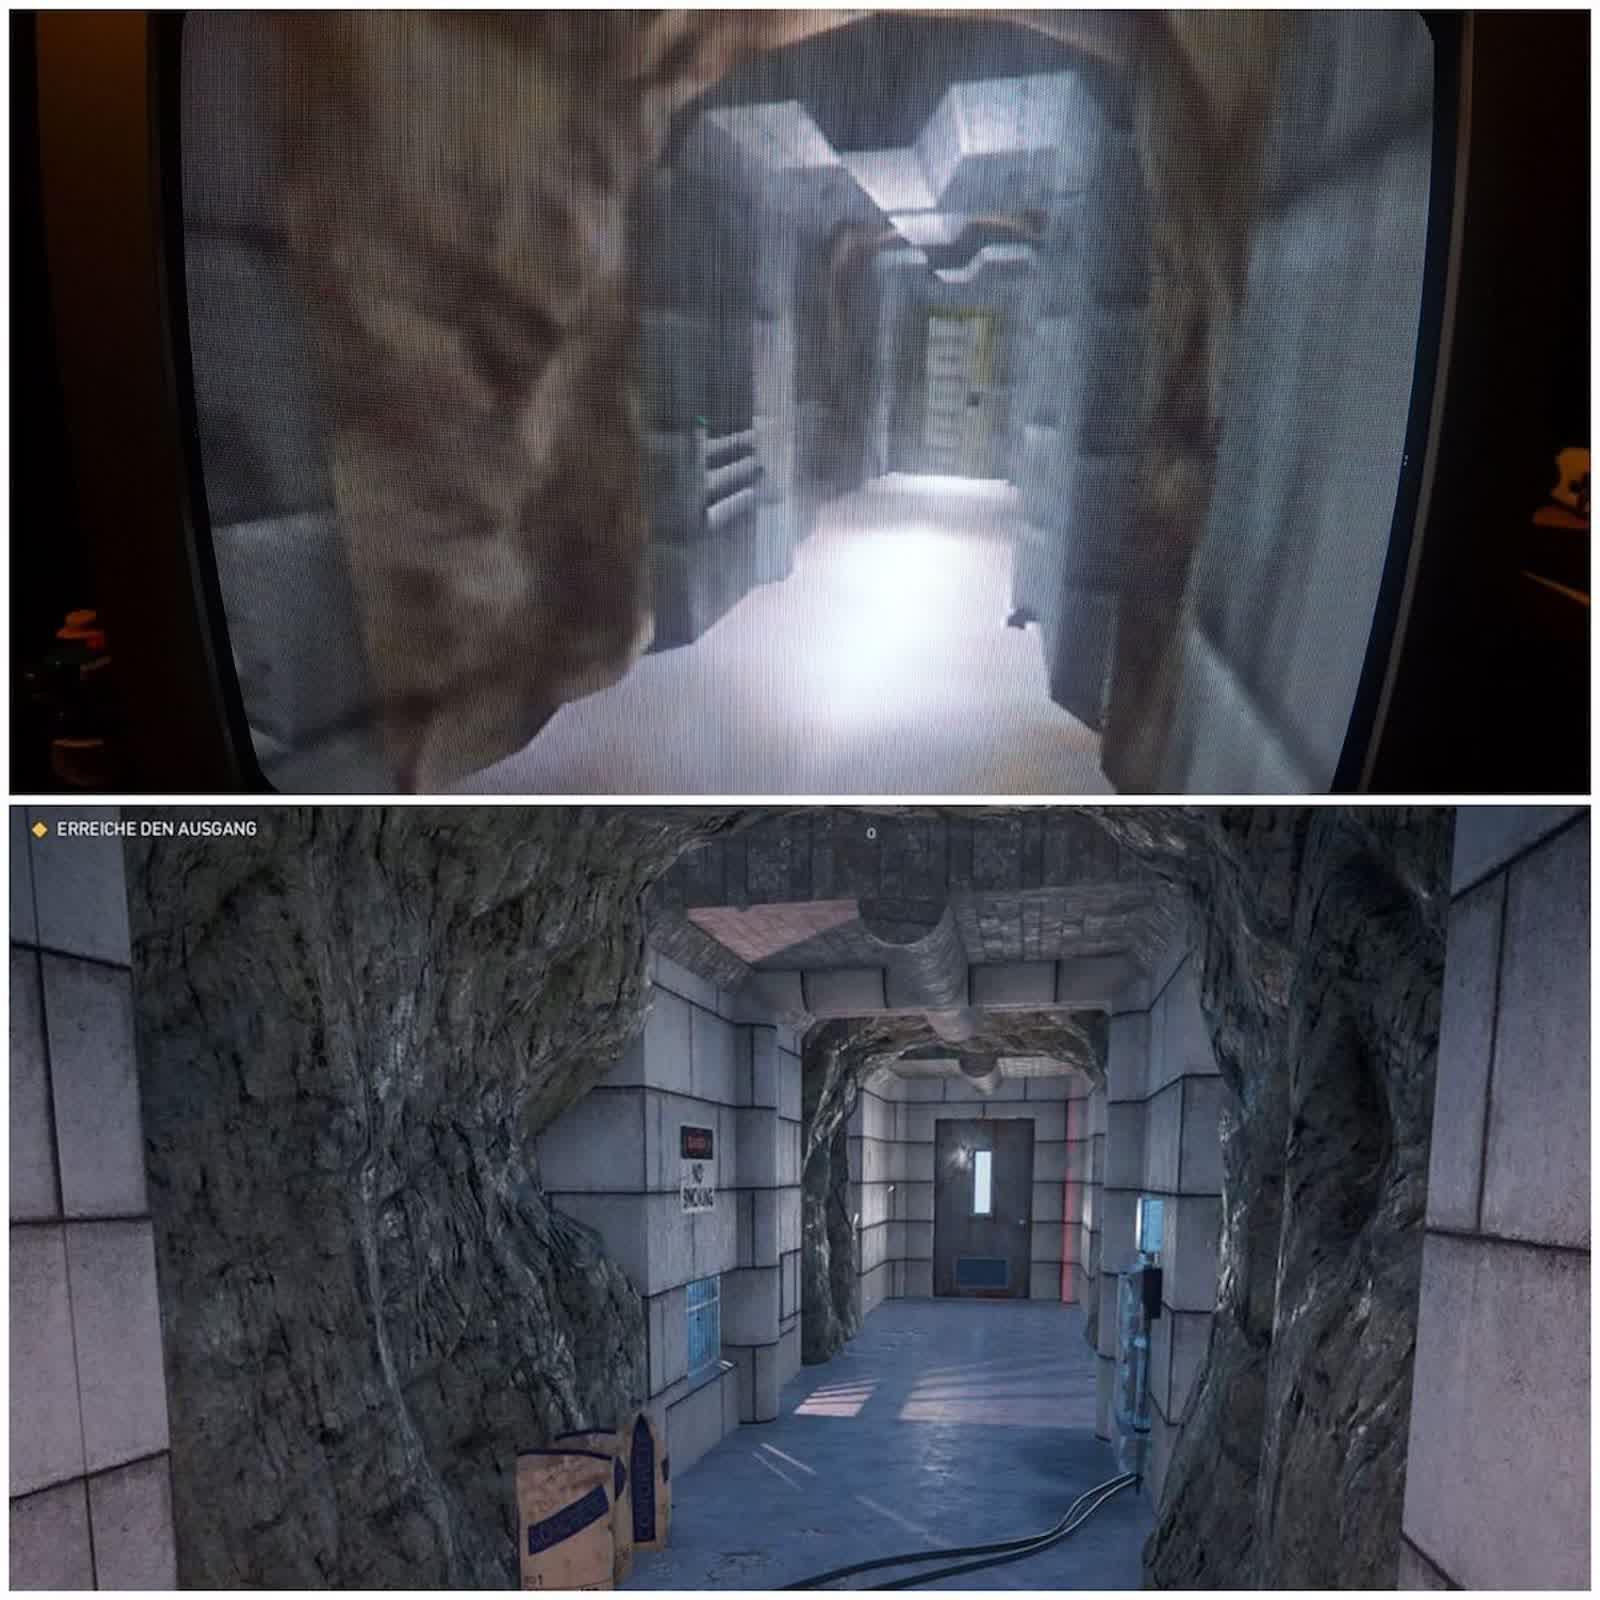 Quelquun a reconstruit GoldenEye 007 dans Far Cry 5 et